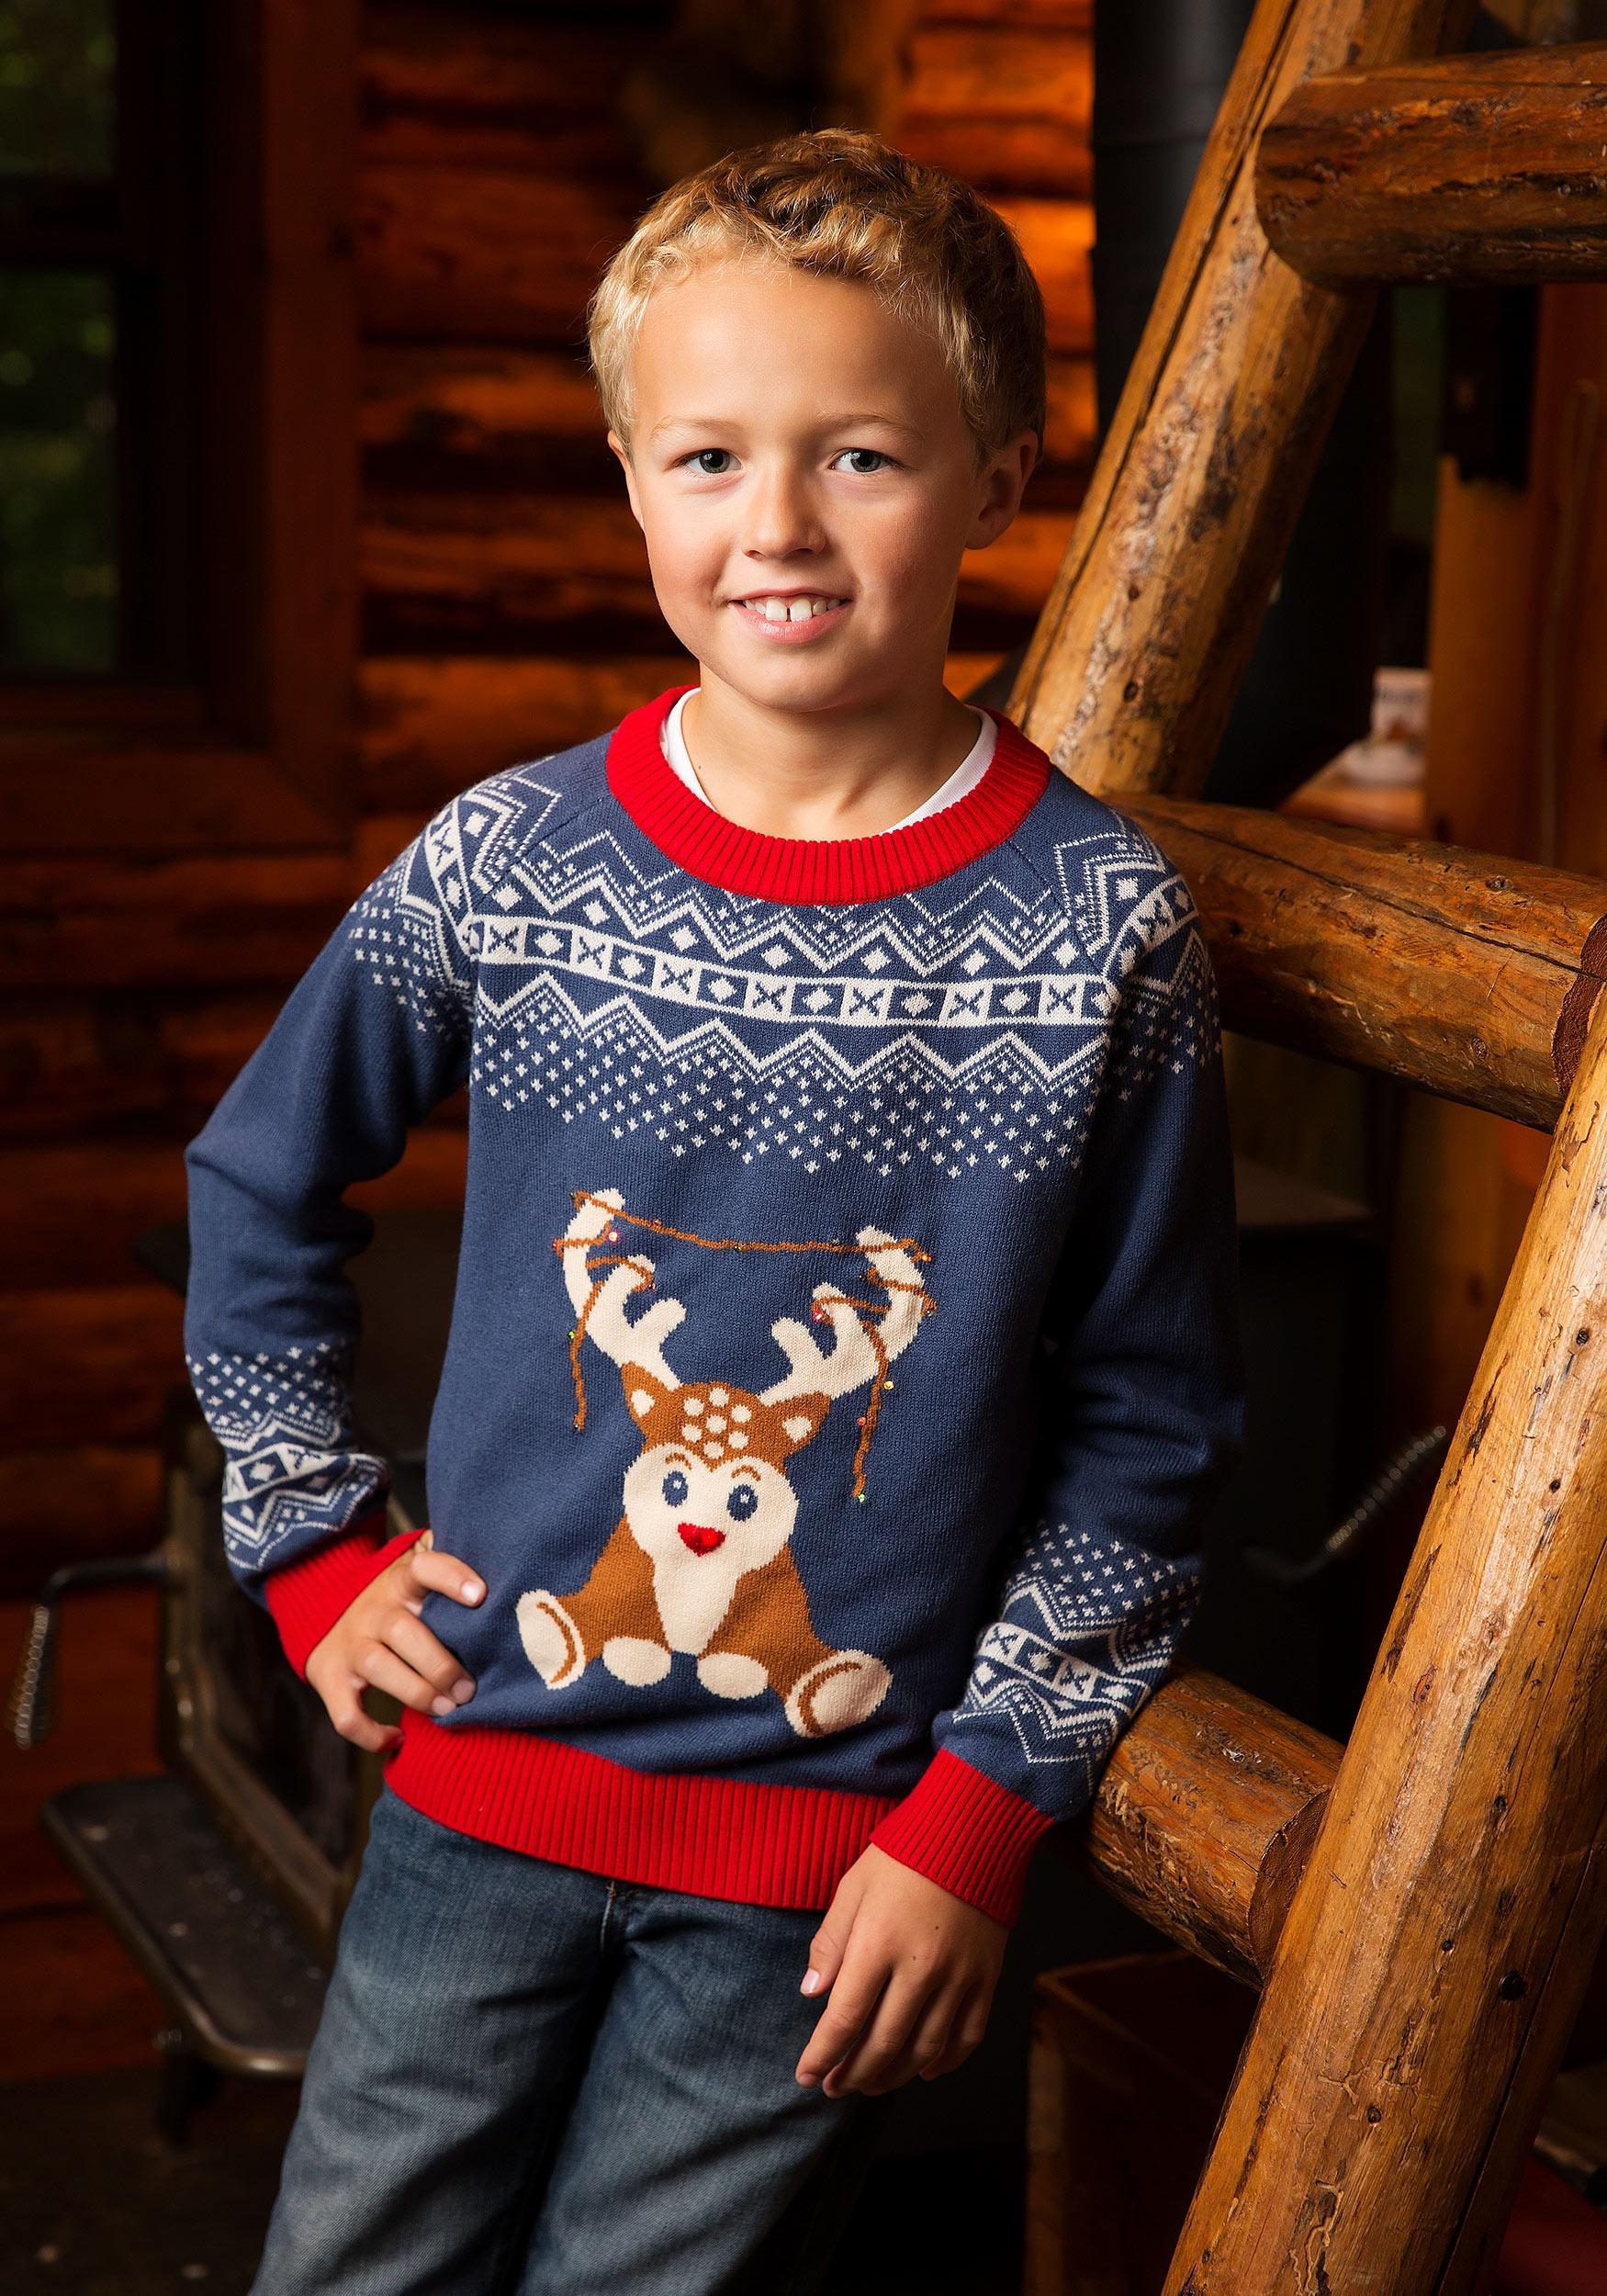 Reindeer Led Light Up Ugly Christmas Sweater For Boys